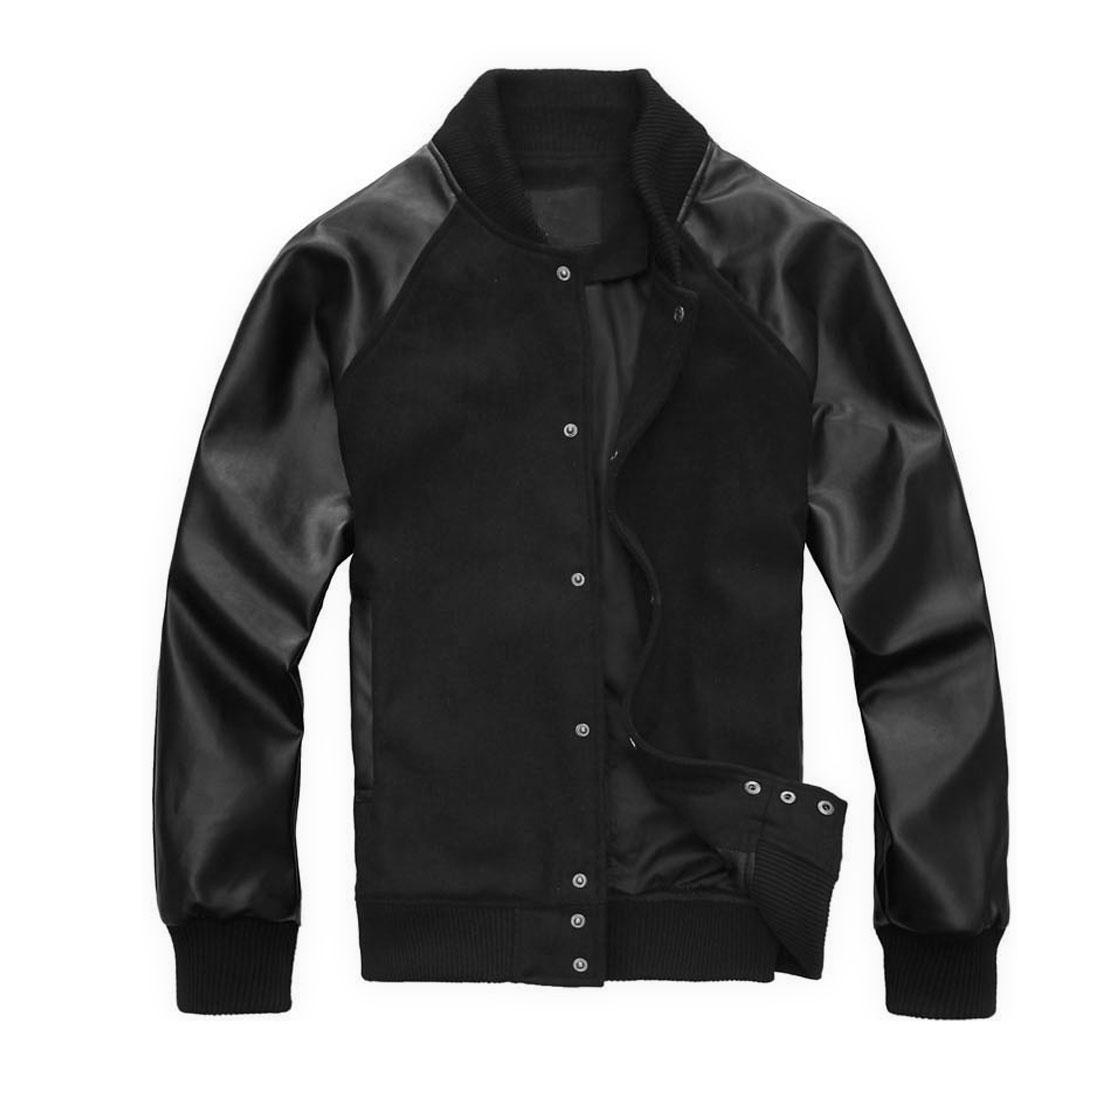 Mens Black Stylish Long Sleeve Stand Collar Single Breasted Slant Pockets Jacket M